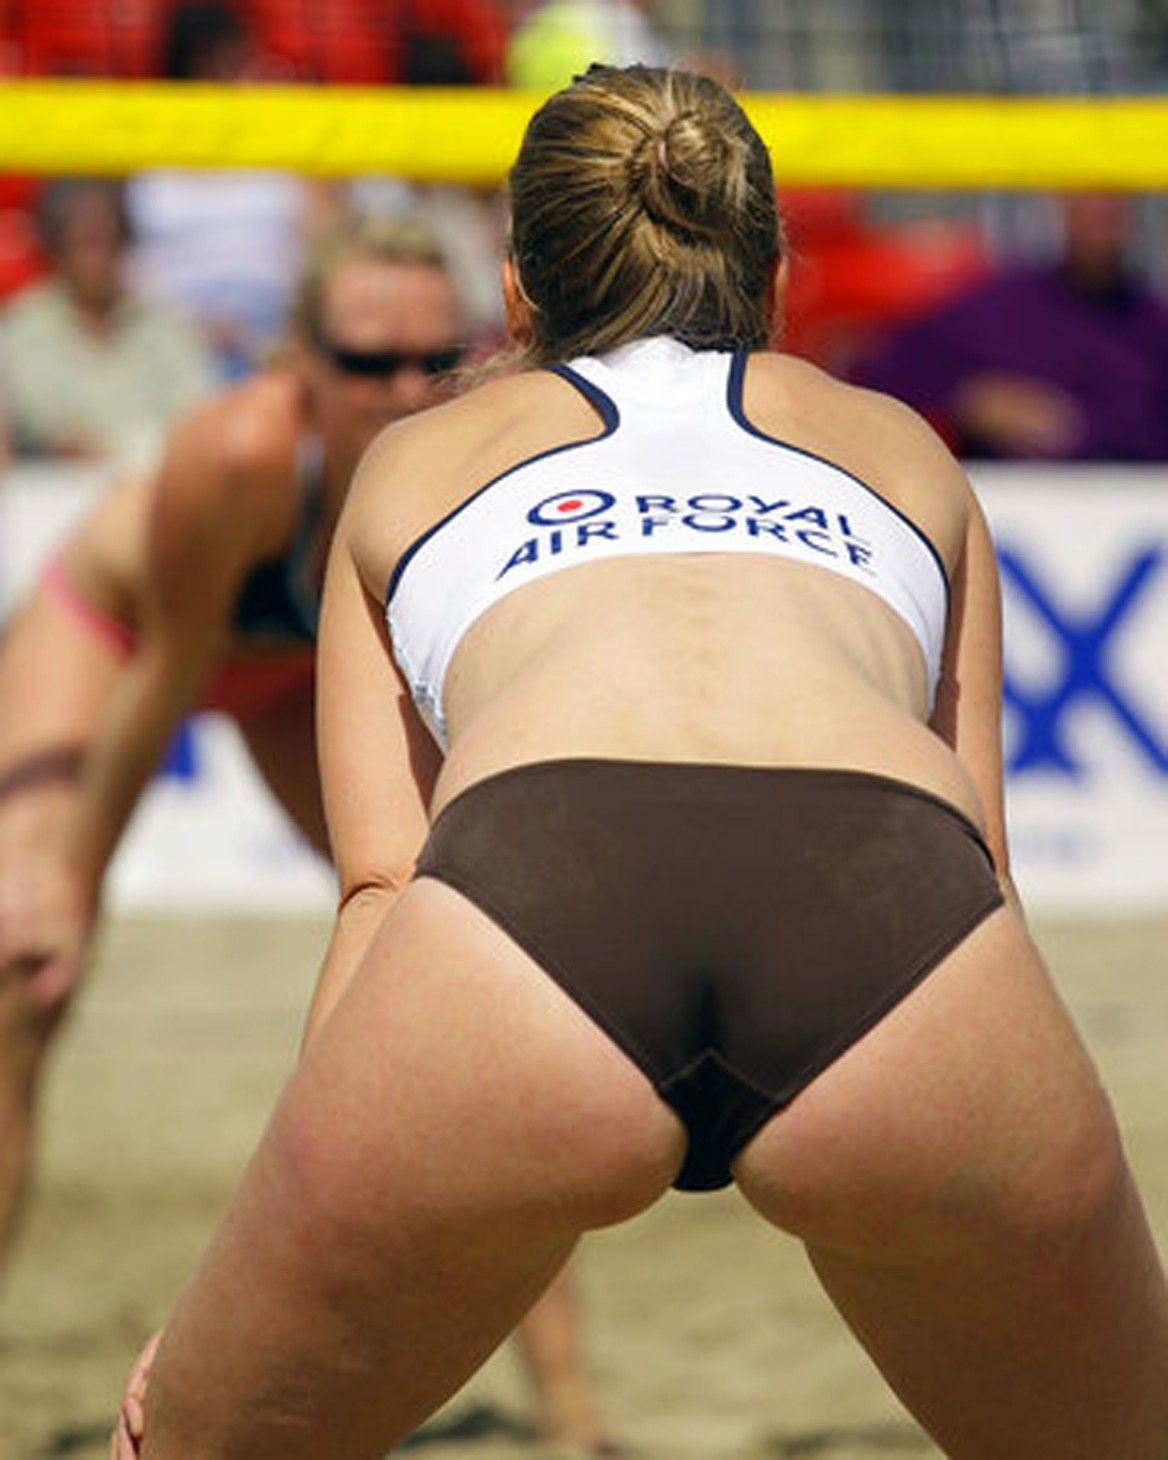 Wardrobemalfunction Beachvolleyball Beach Volleyball Women Volleyball Volleyball Outfits